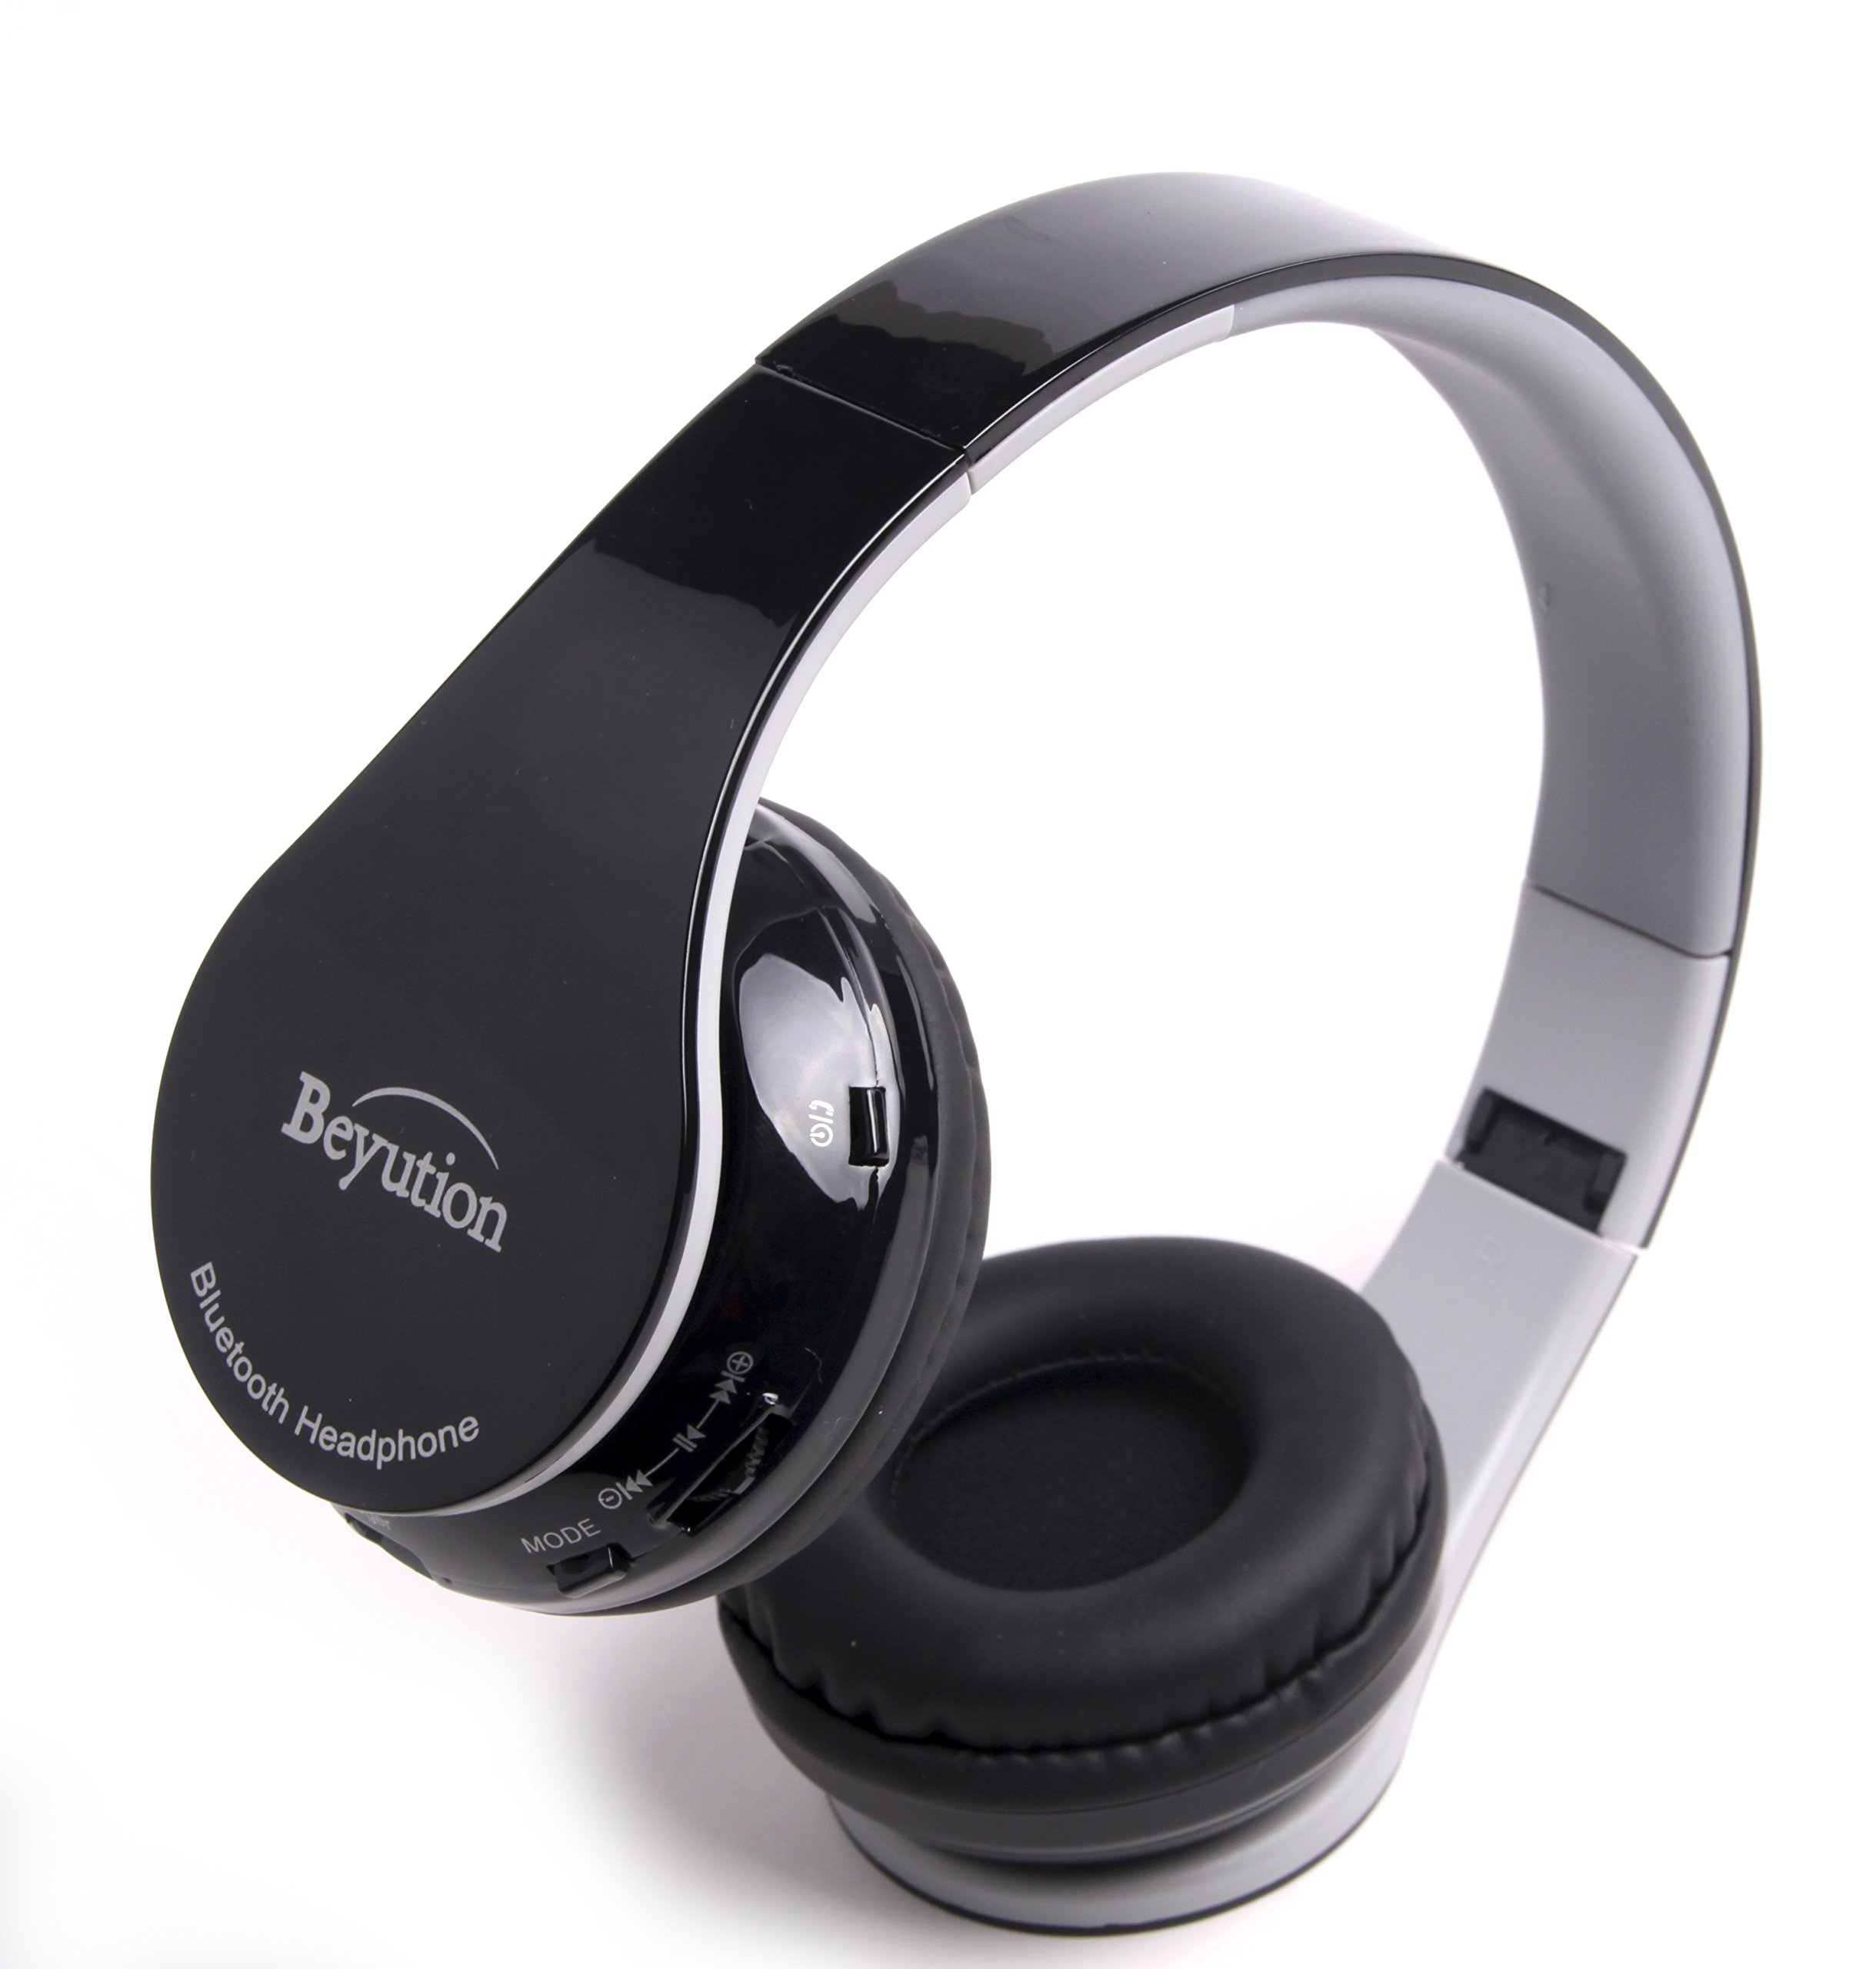 Auriculares Beyution Hi-fi Stereo Inalambrico Bluetooth Para Apple All iPad Ipo Samsung Galaxy S4/s3; Nook; Visual Land